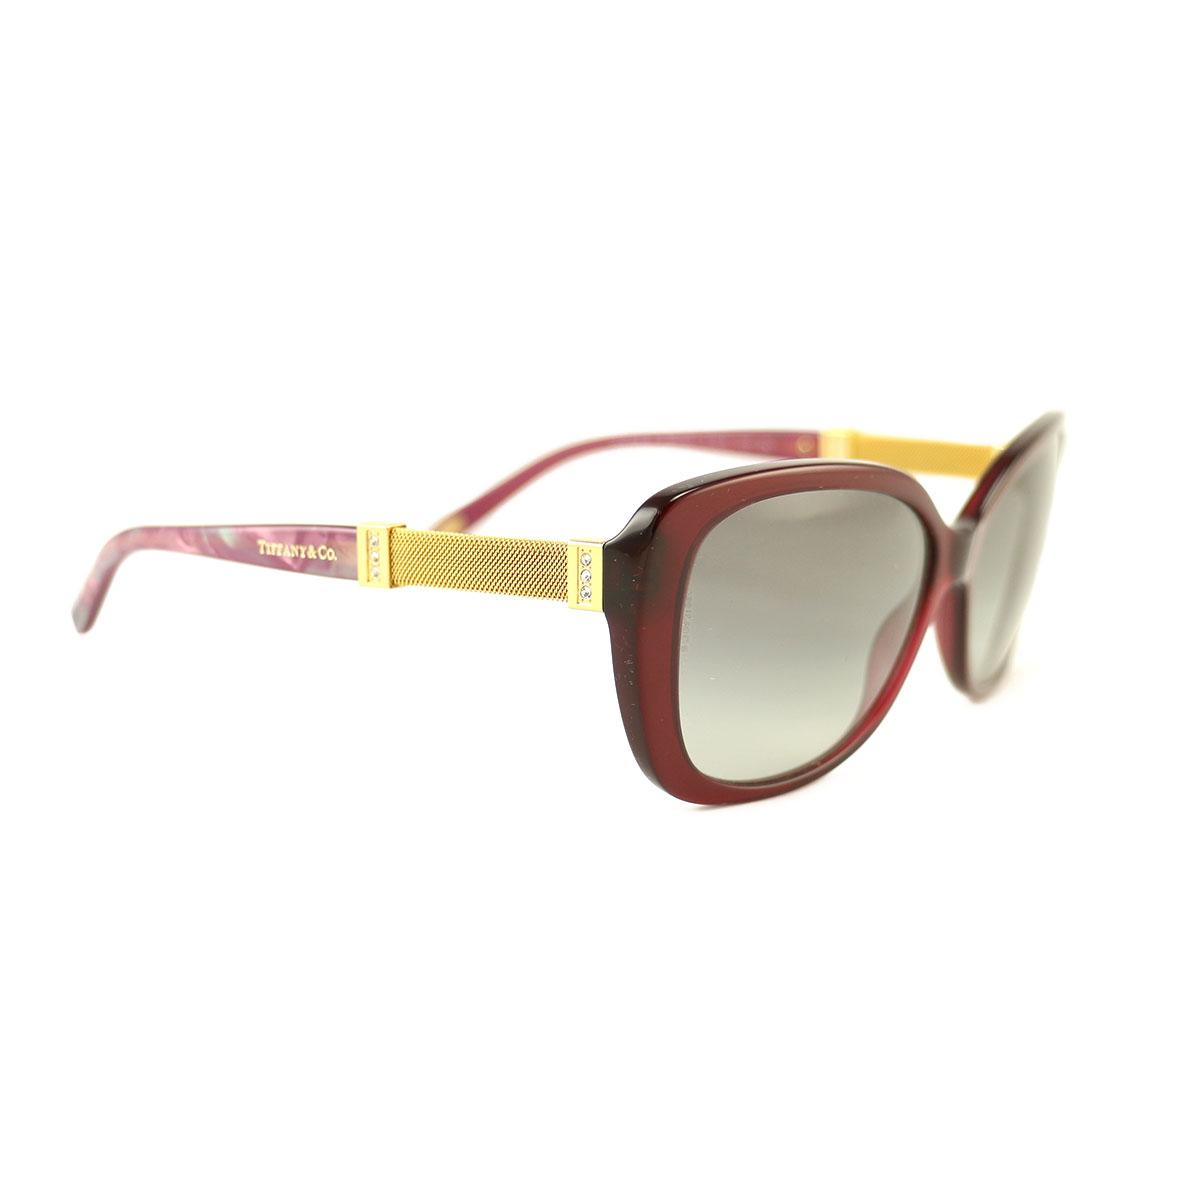 e1ea8091ddce New Tiffany   Co. Sunglasses TF 4106-B-8003-3C Wine Gold Acetate 57 15 140